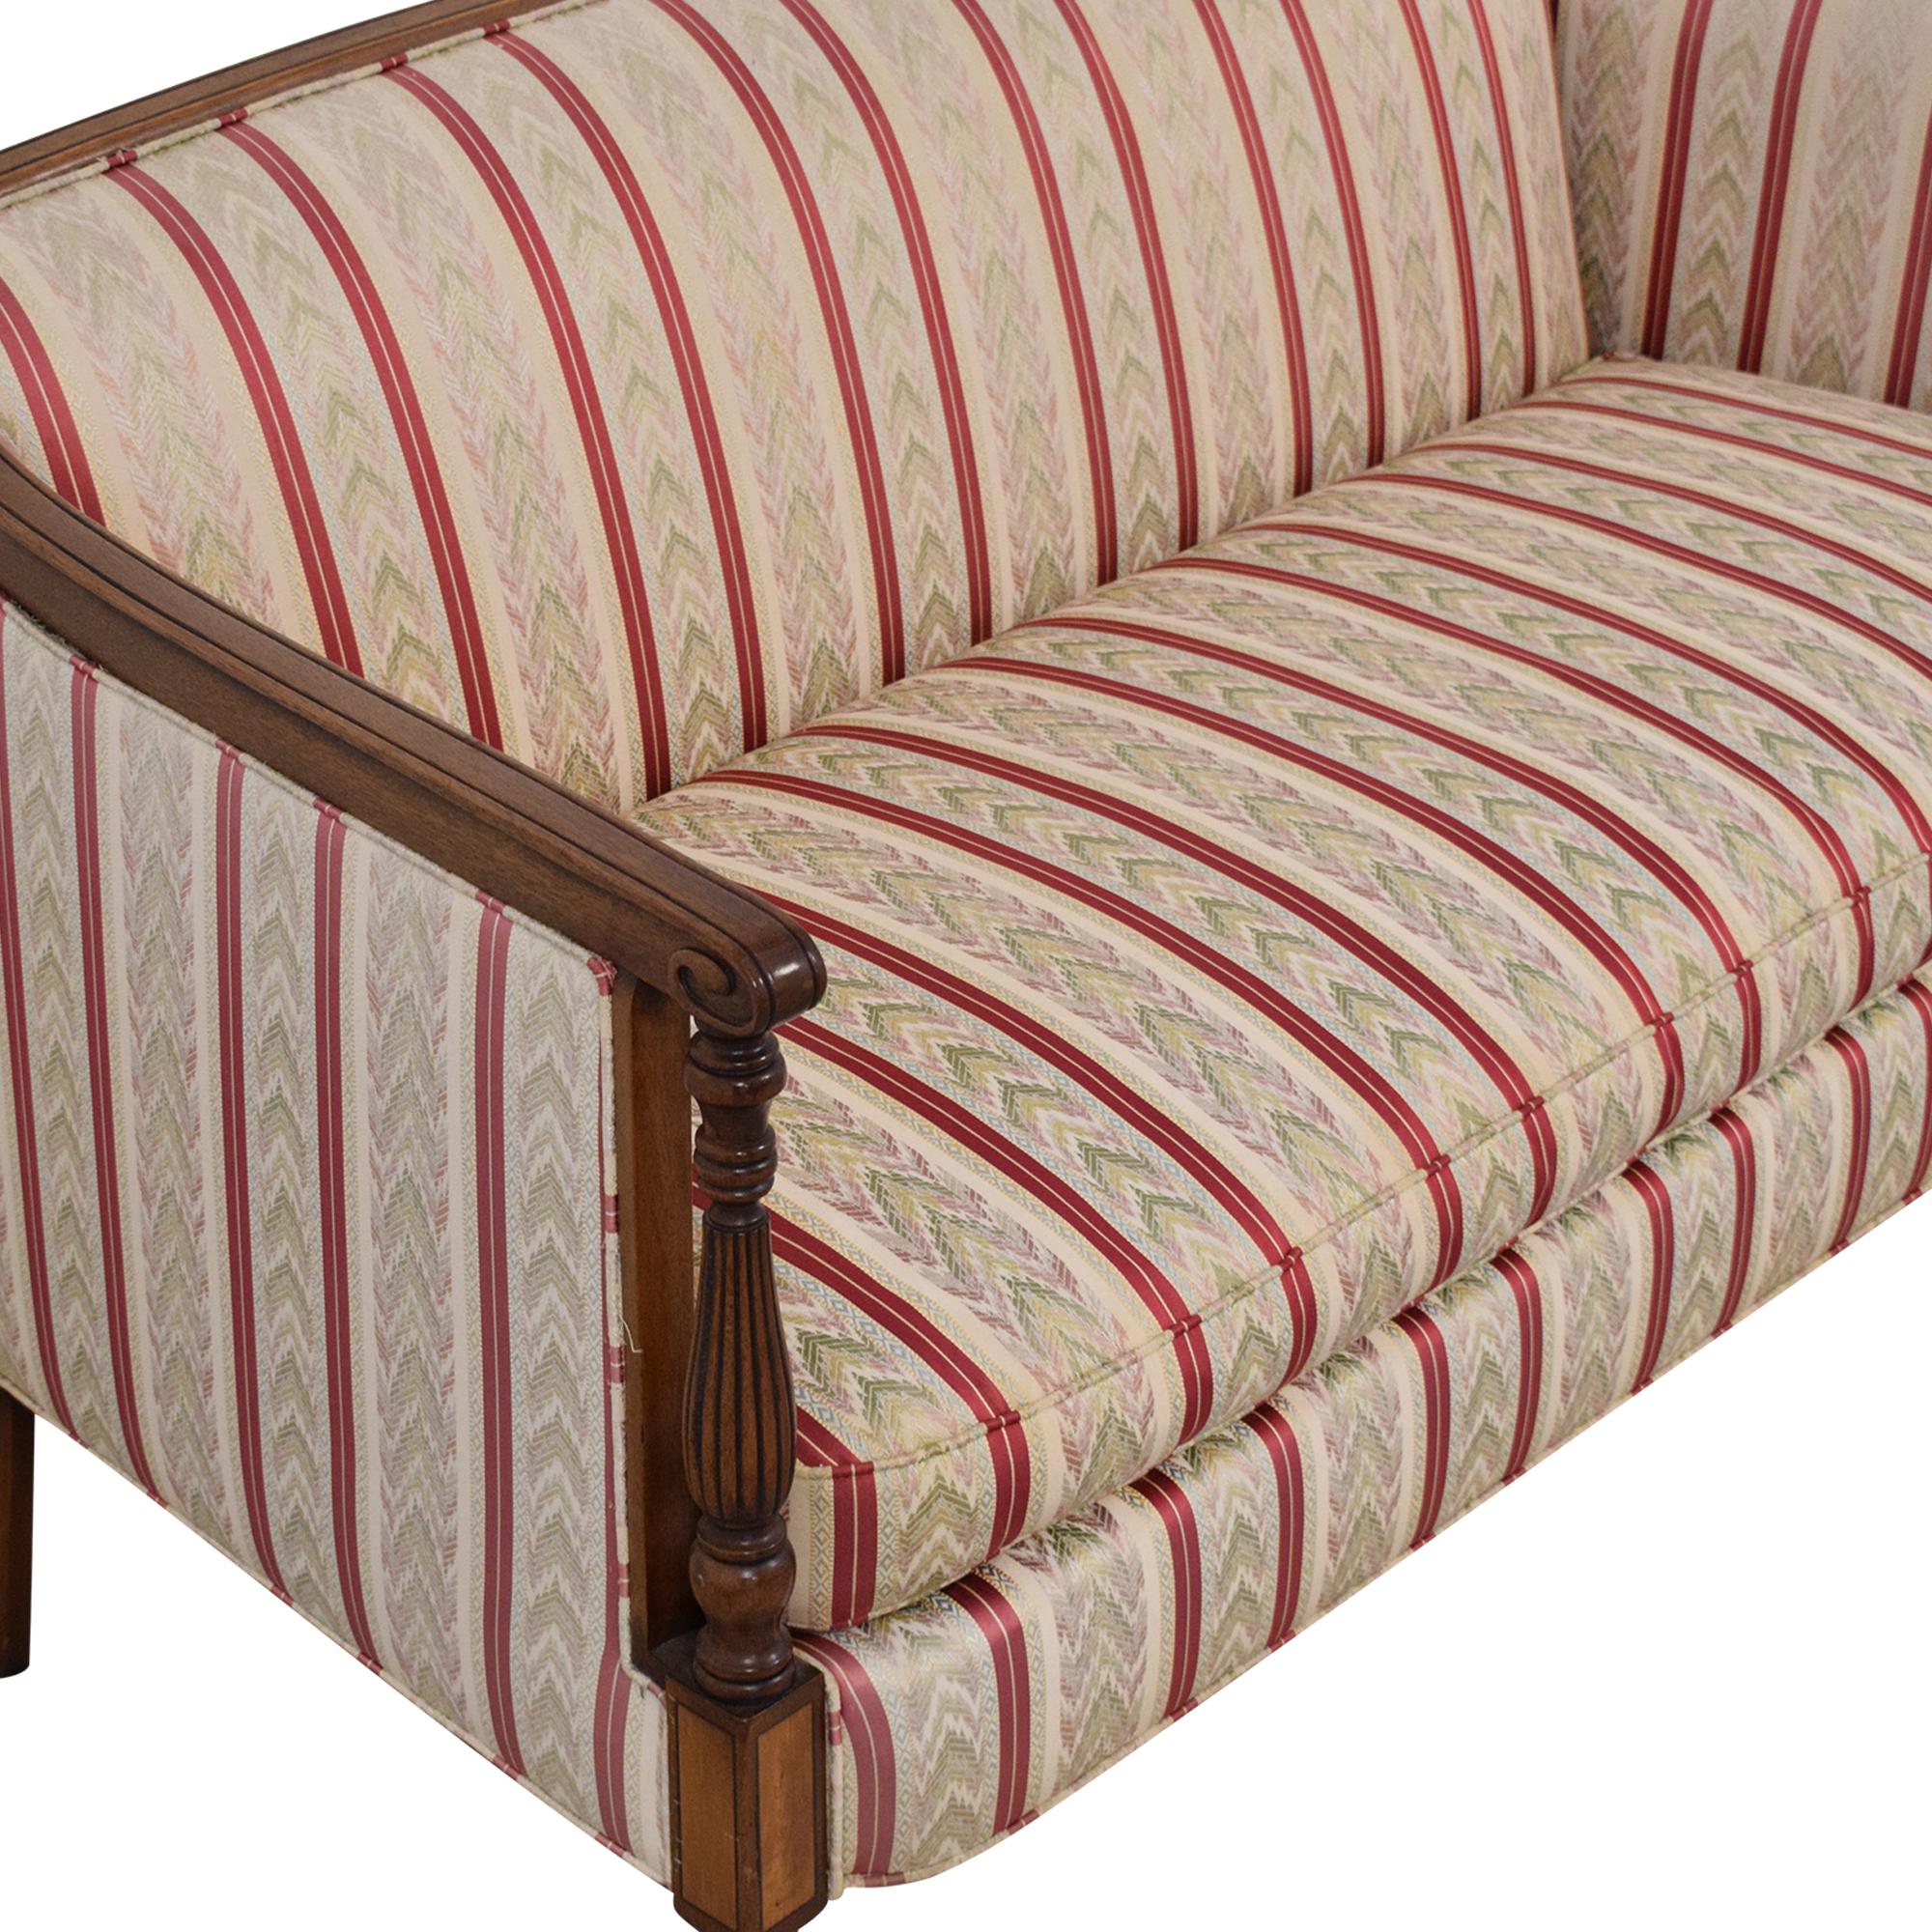 W & J Sloane Single Cushion Sofa W. & J. Sloane